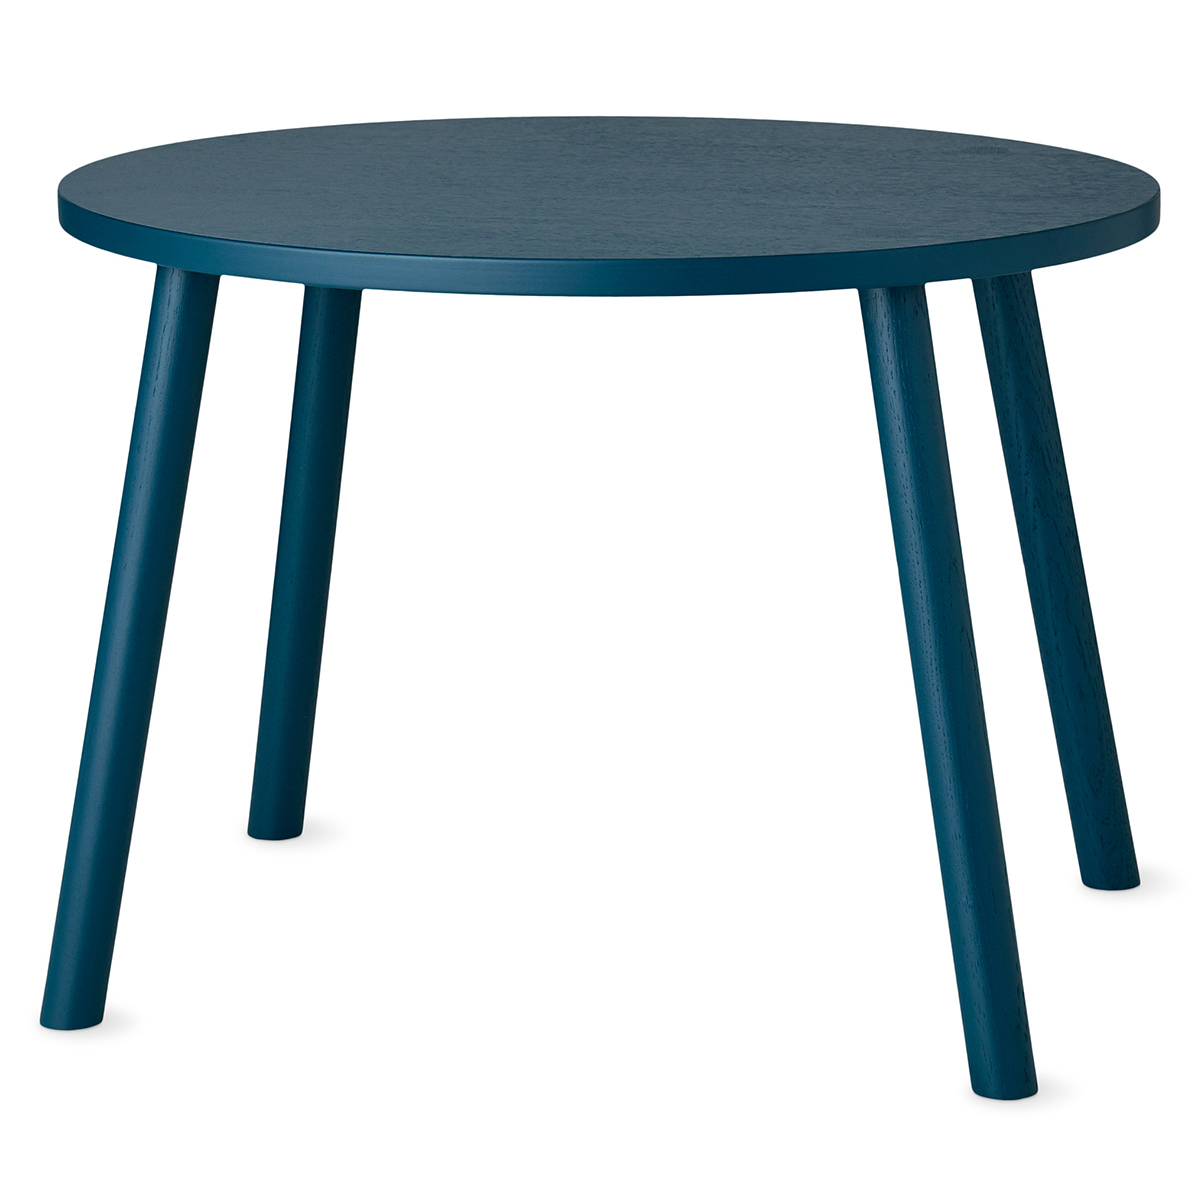 Table & Chaise Table Mouse - Petroleum Table Mouse - Petroleum